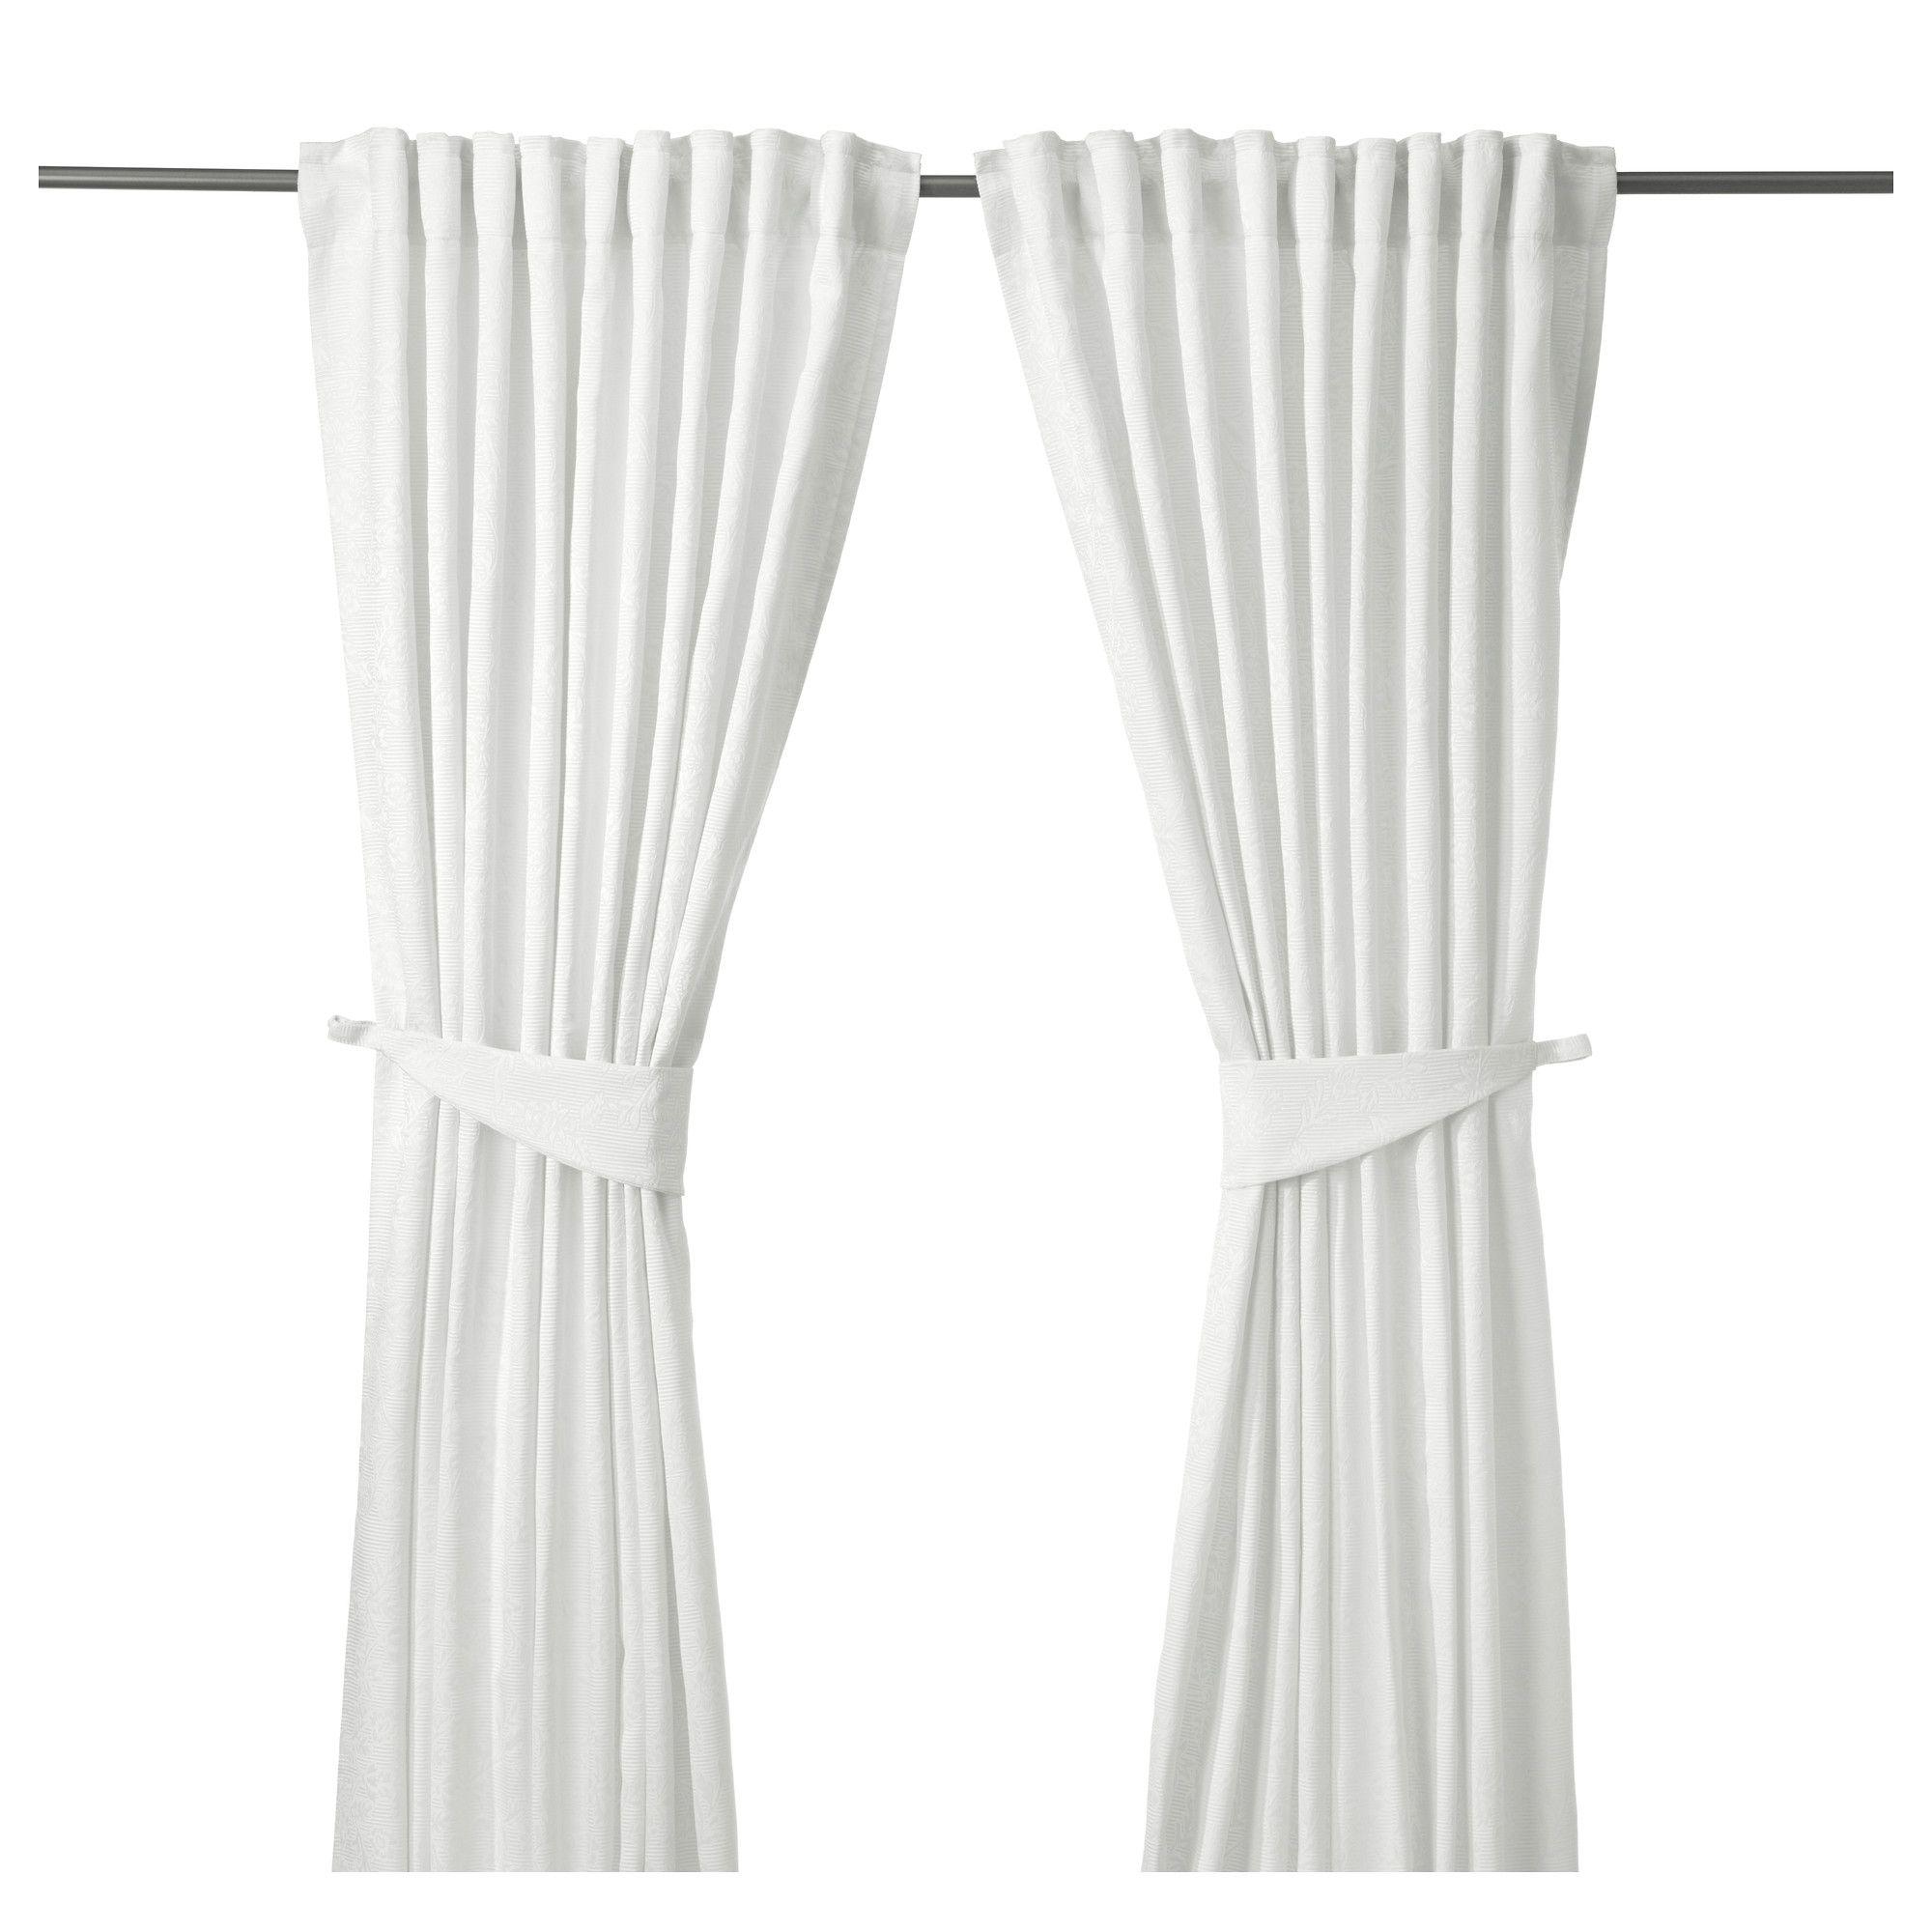 Bedroom Curtain Rod